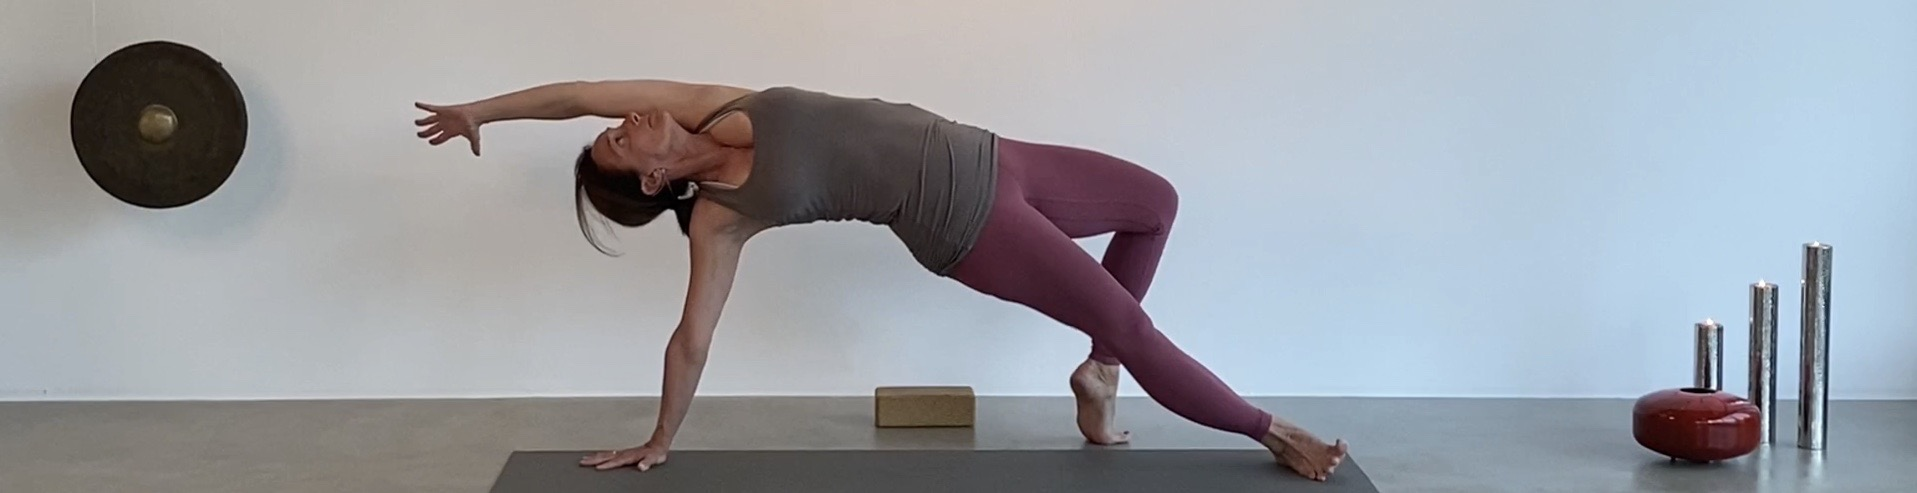 yogaatelier online Stefanie